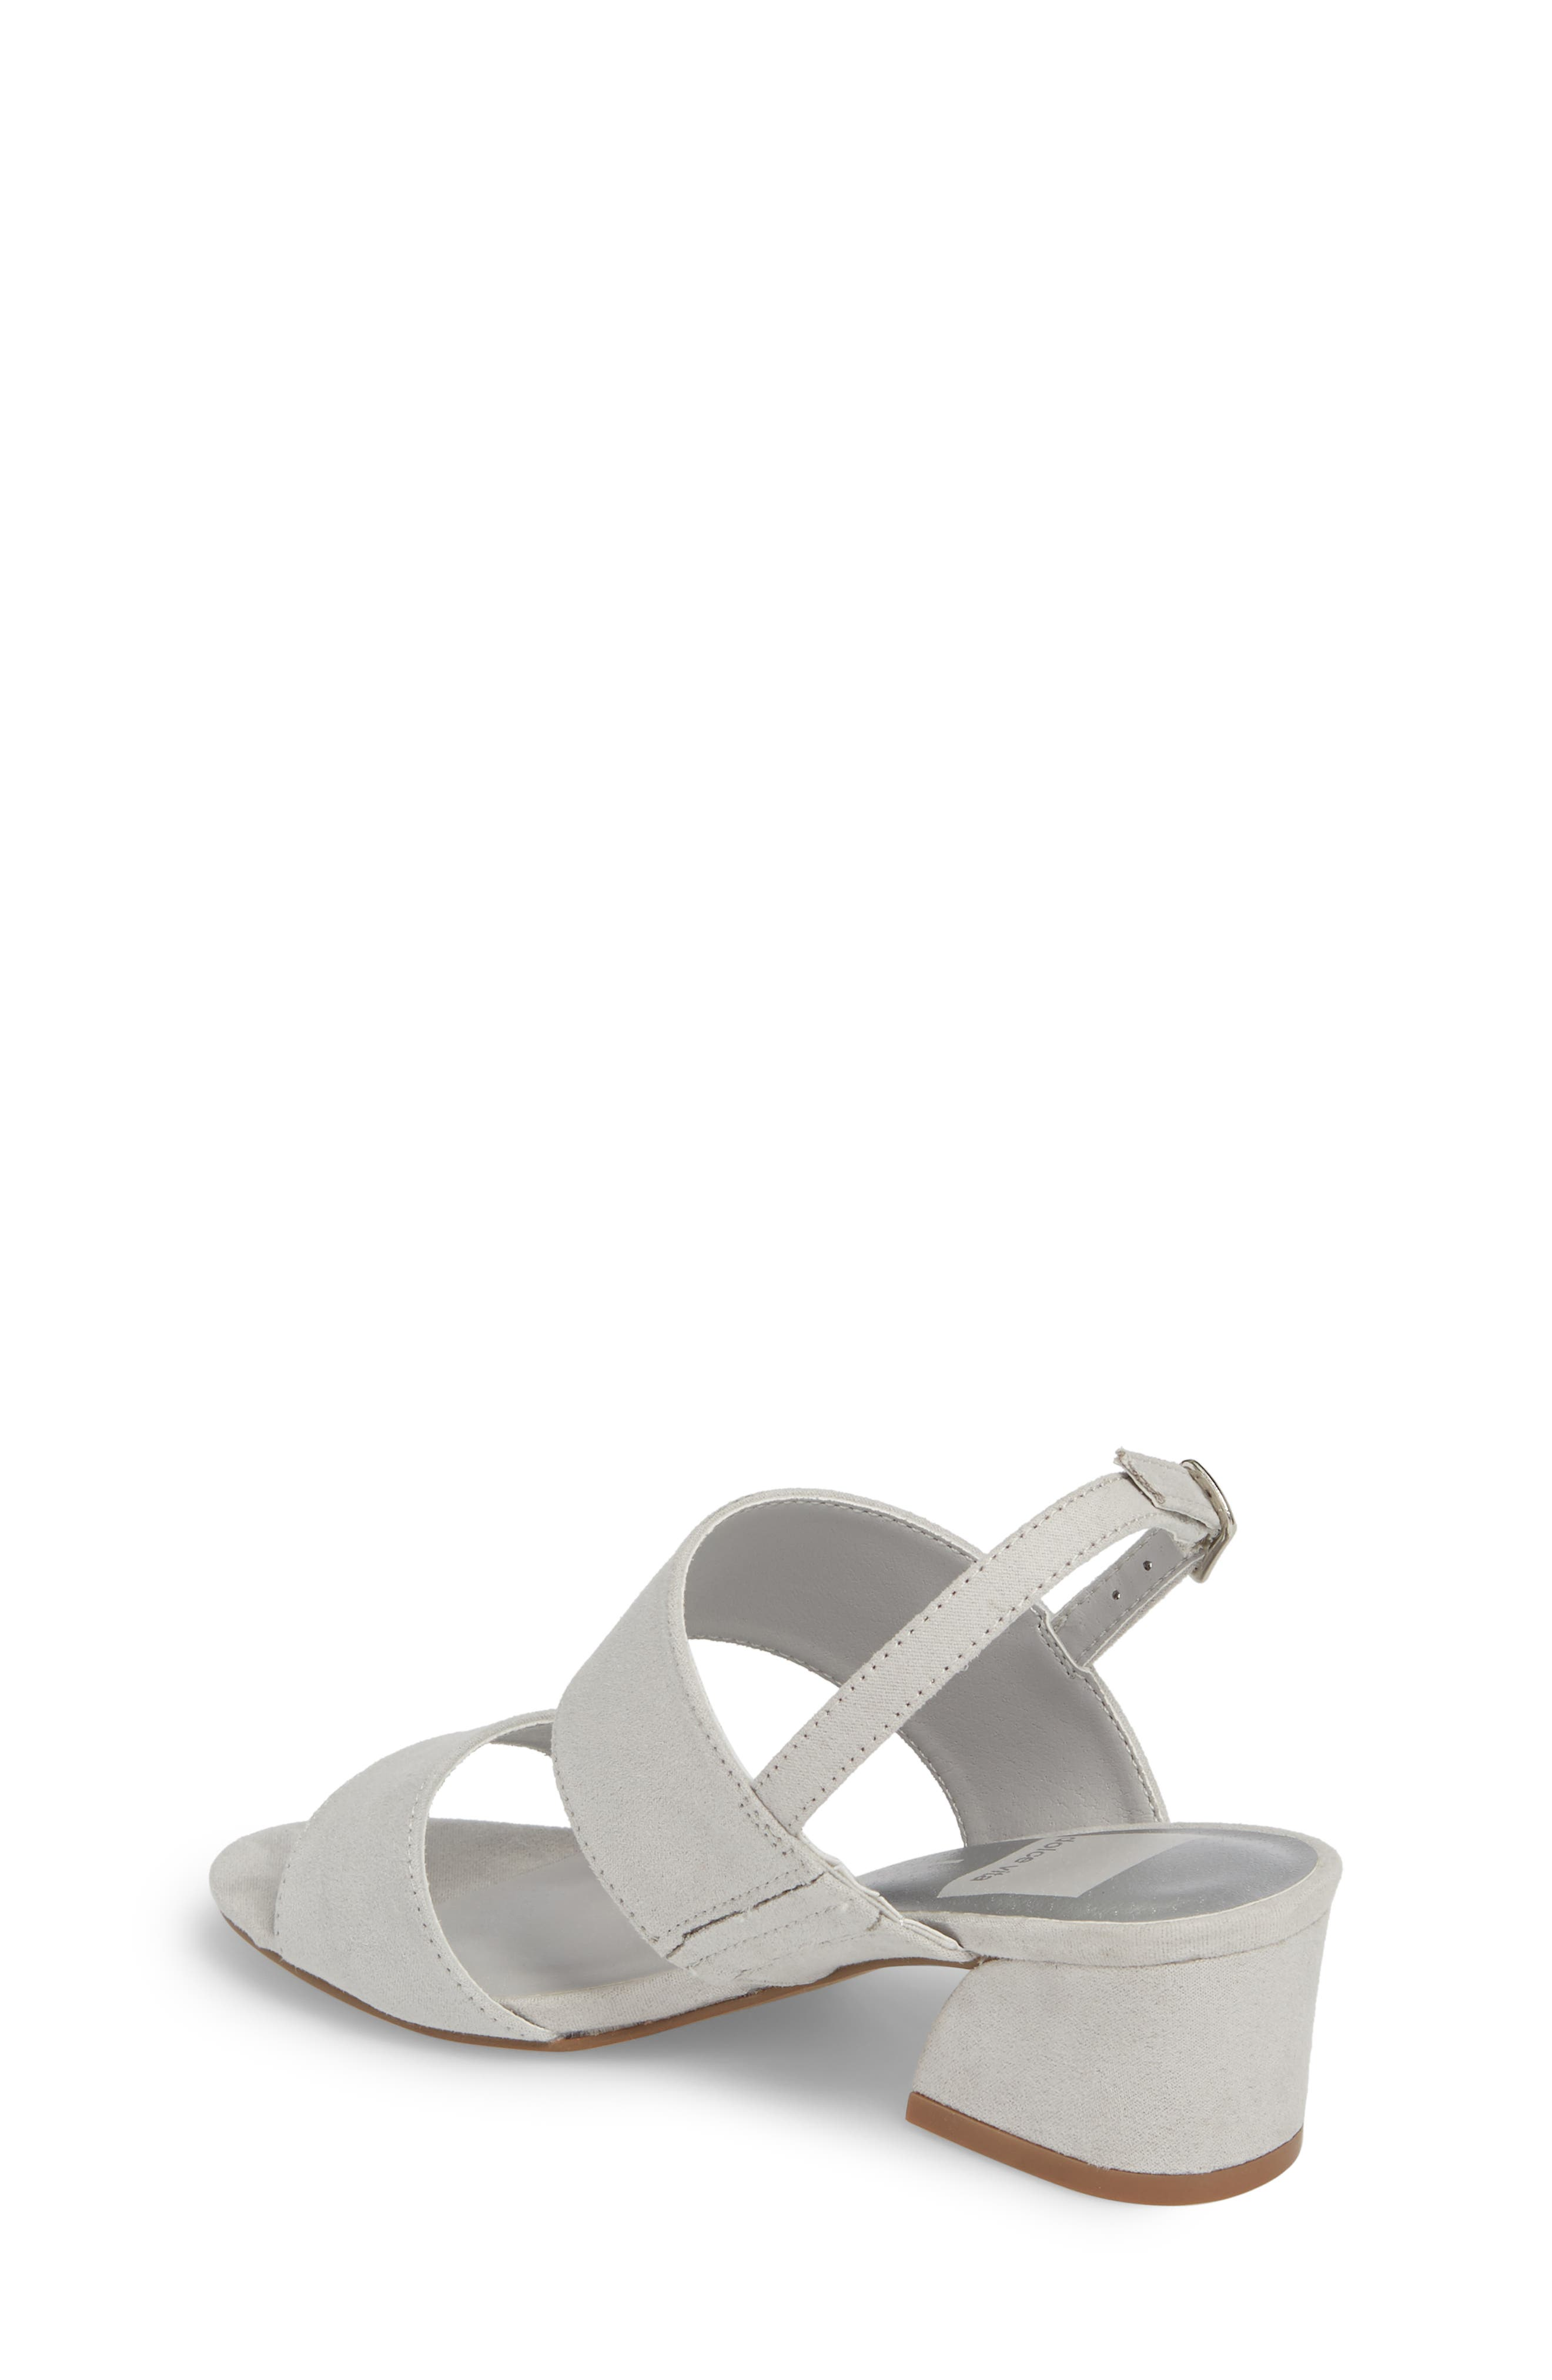 Lorne Flared Heel Sandal,                             Alternate thumbnail 2, color,                             025